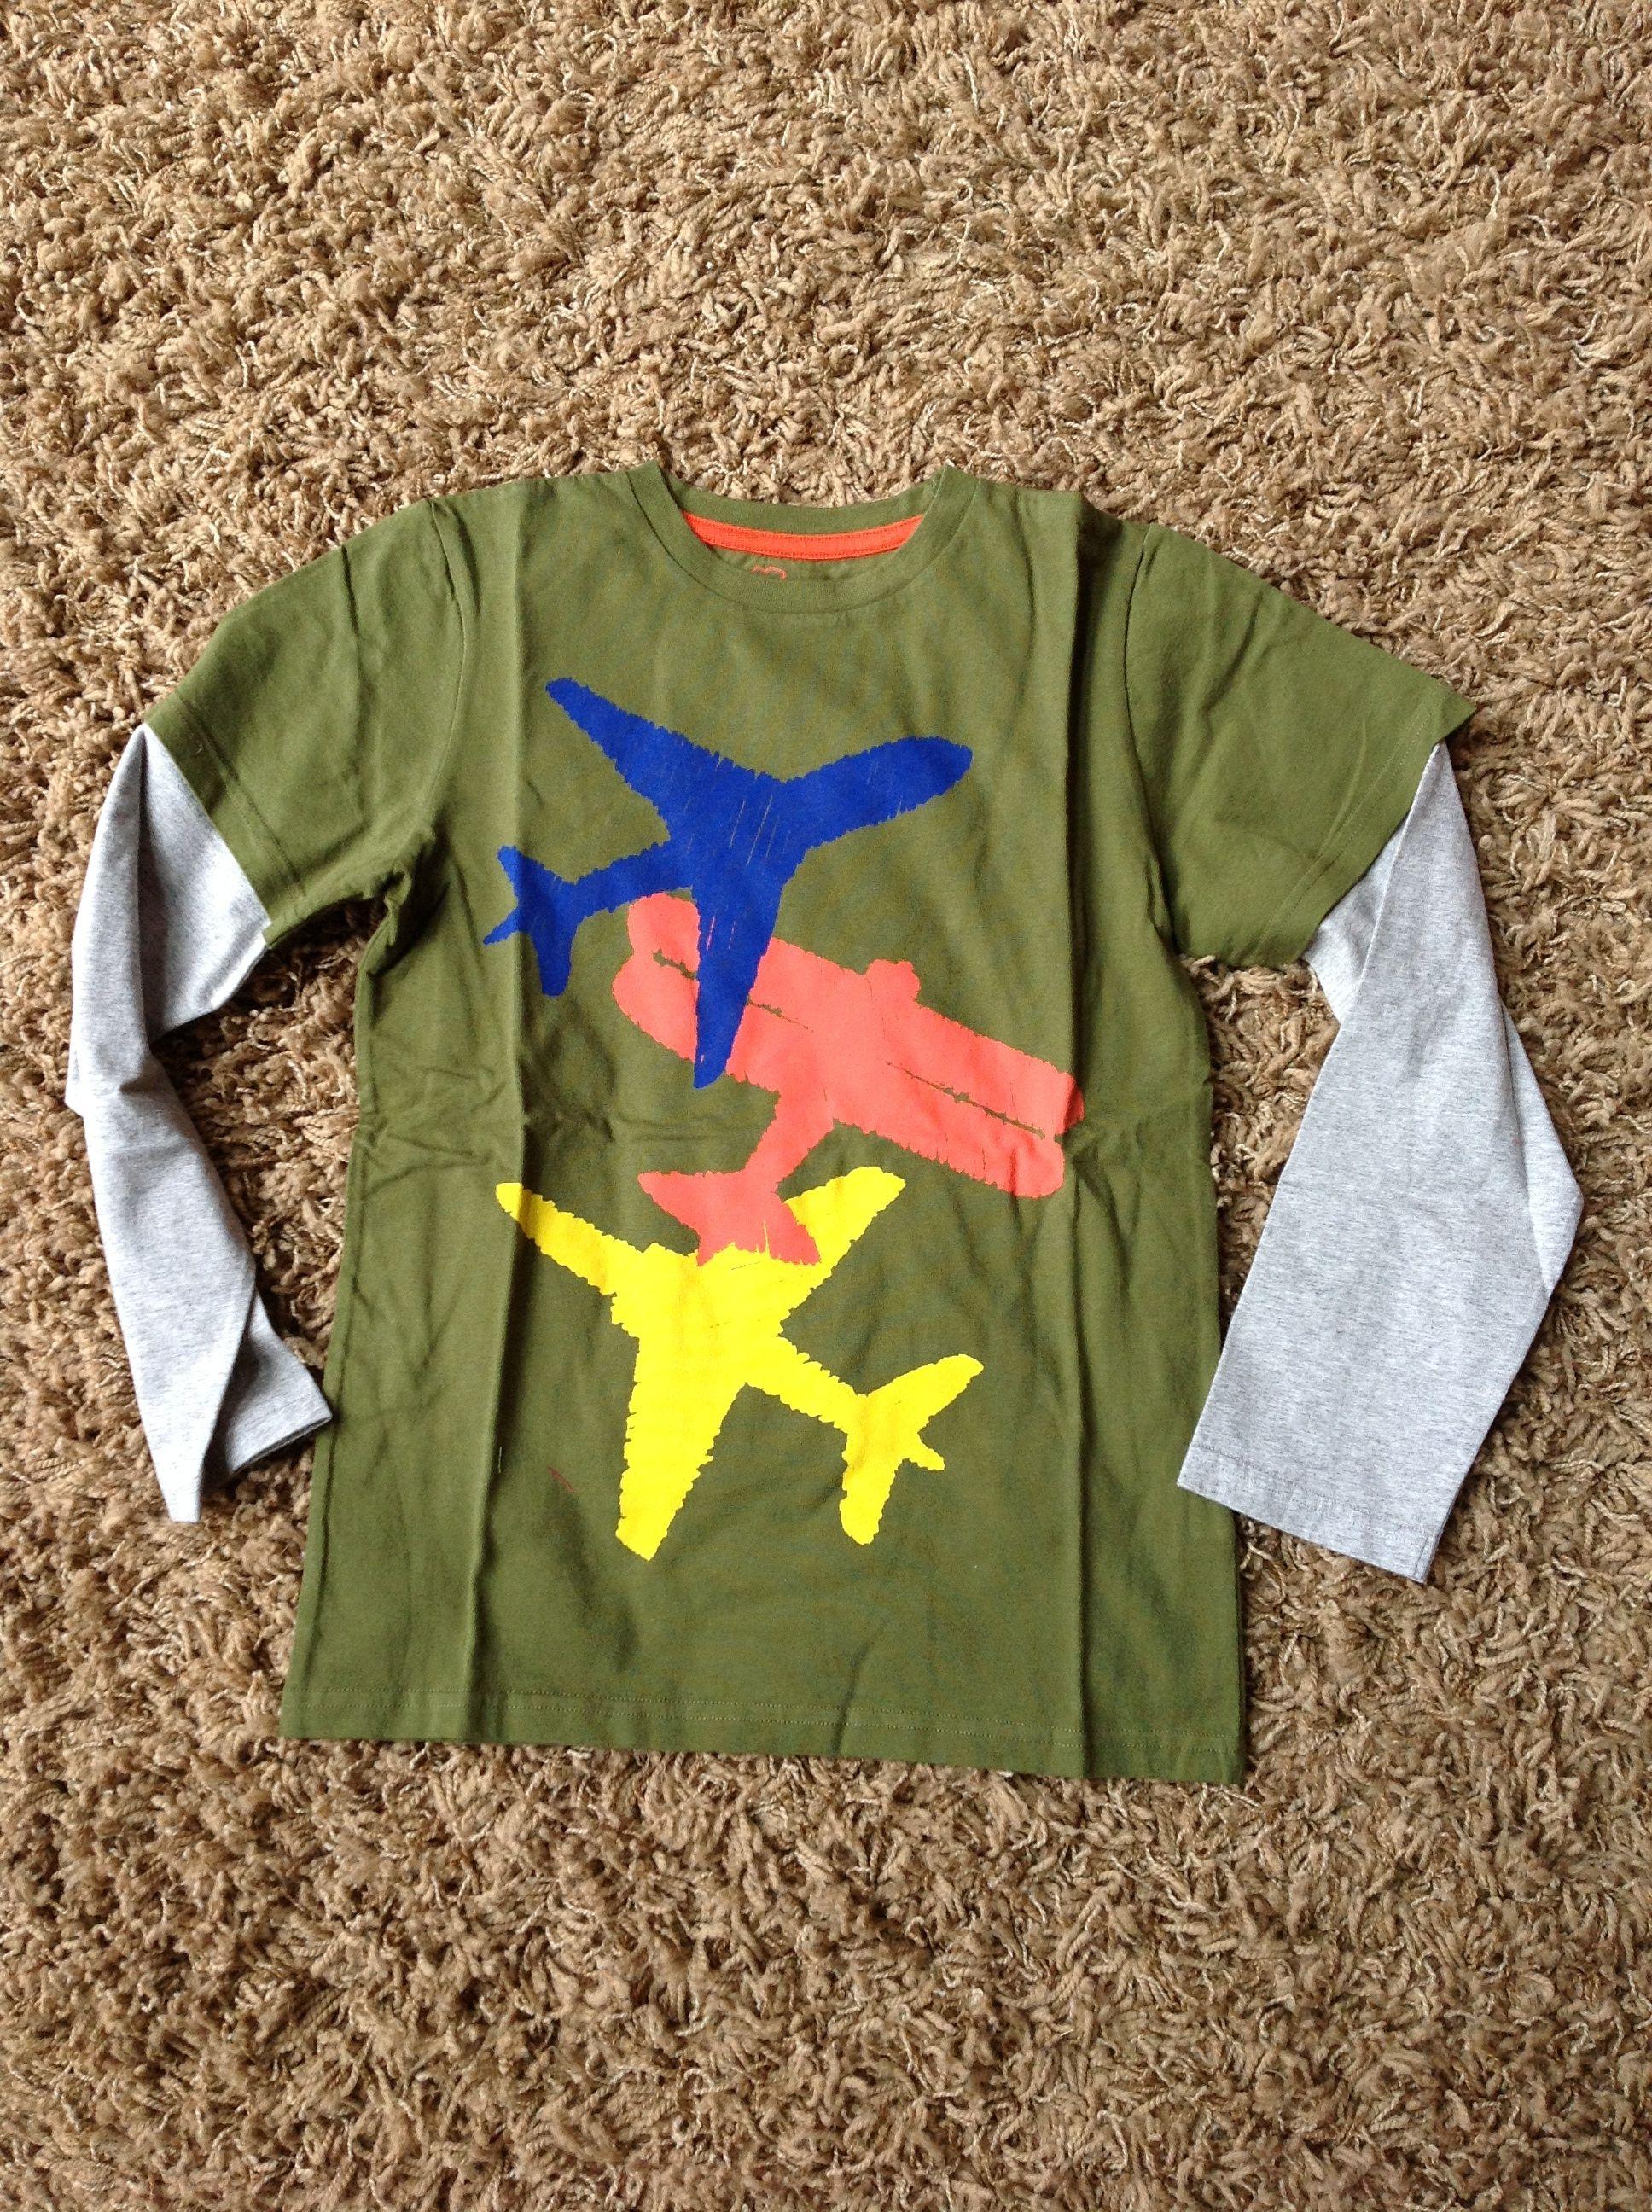 9-10, Basil/Planes Layered Print t-shirt - MiniBoden (2014).